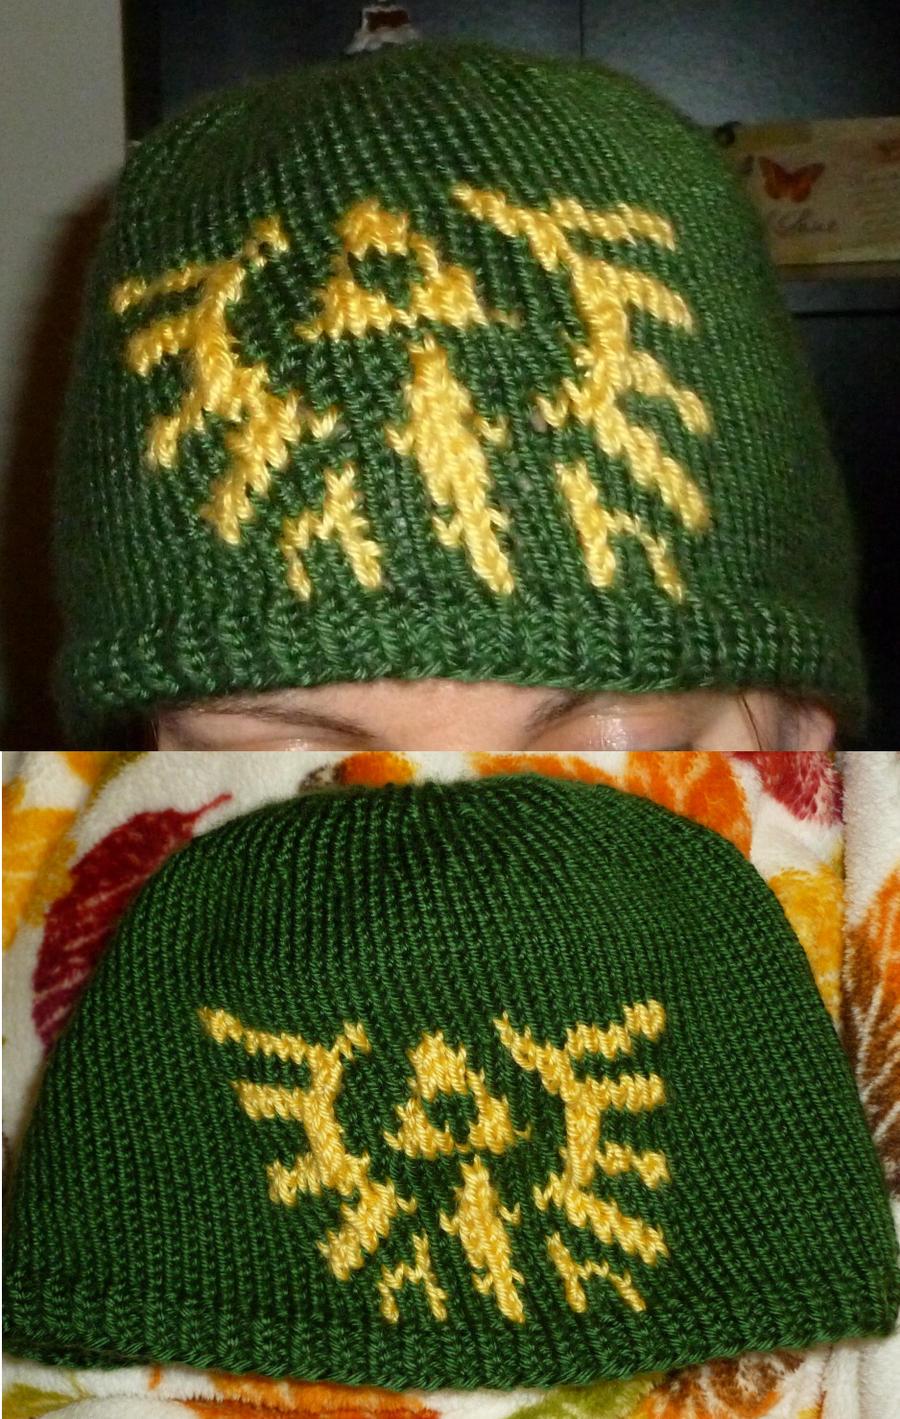 Zelda Hat Knitting Pattern : Legend of Zelda Hylian Crest Hat by prezofxms on DeviantArt